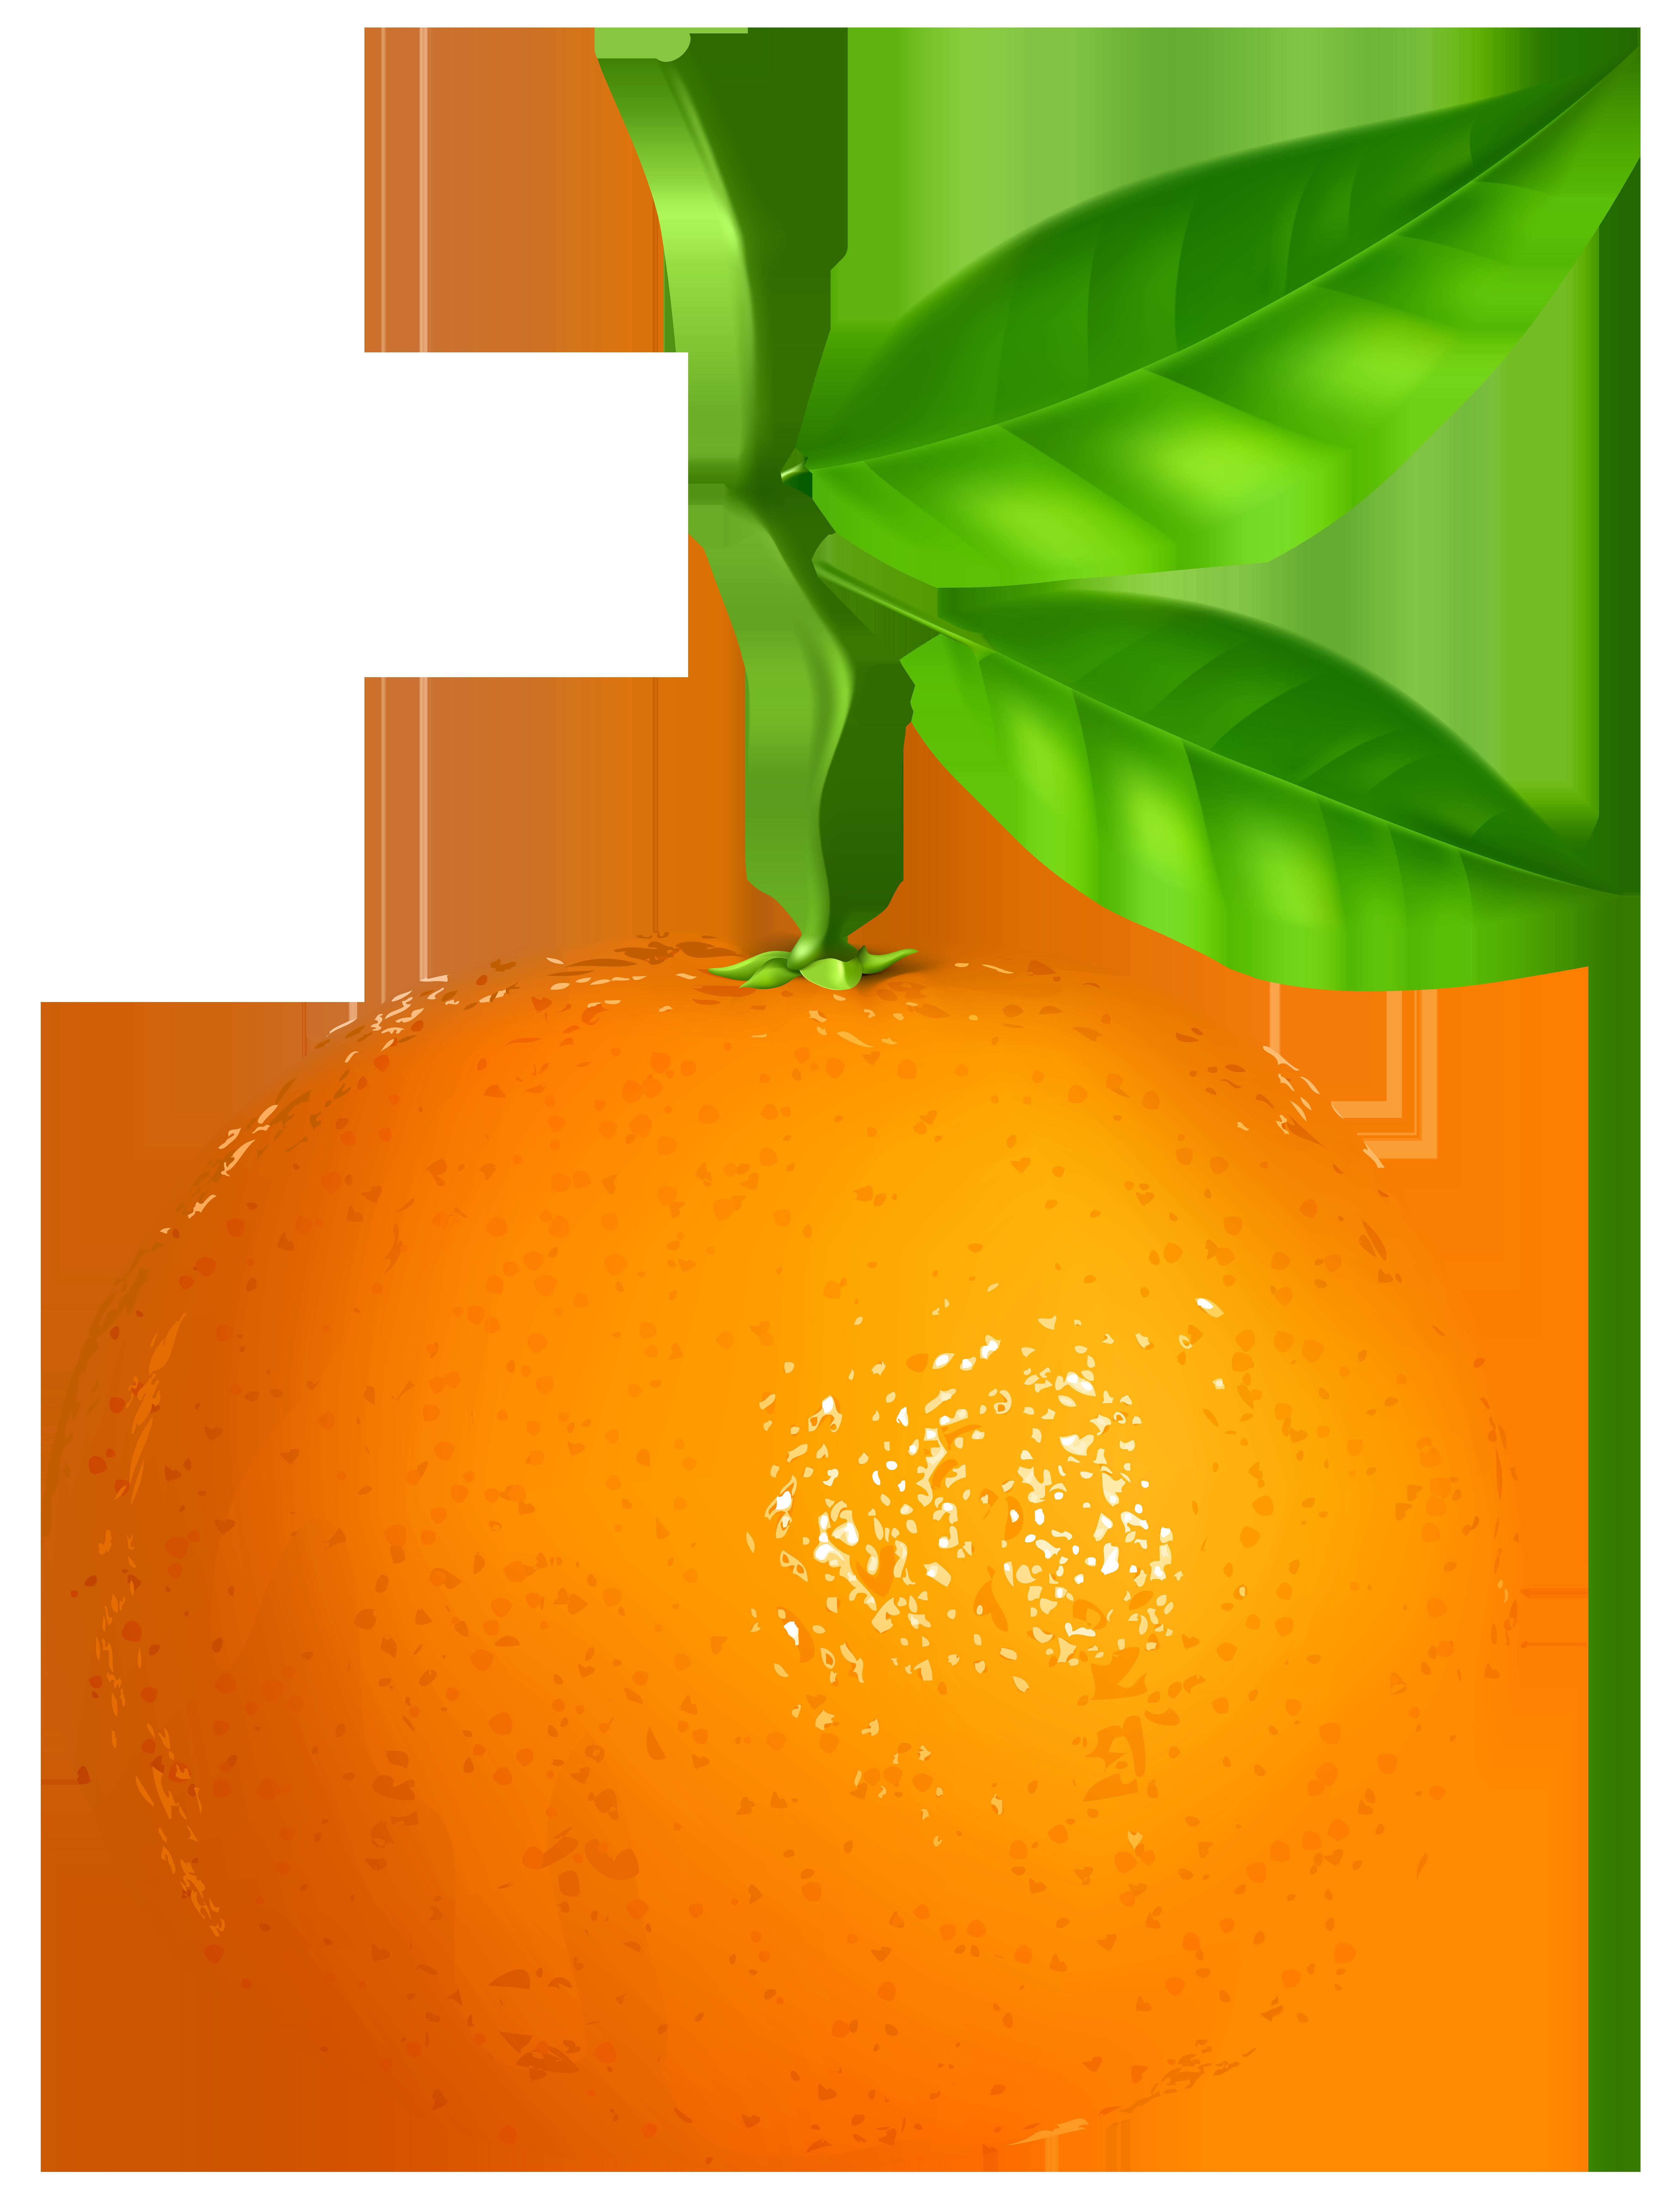 Tangerine Transparent PNG Clip Art Image.